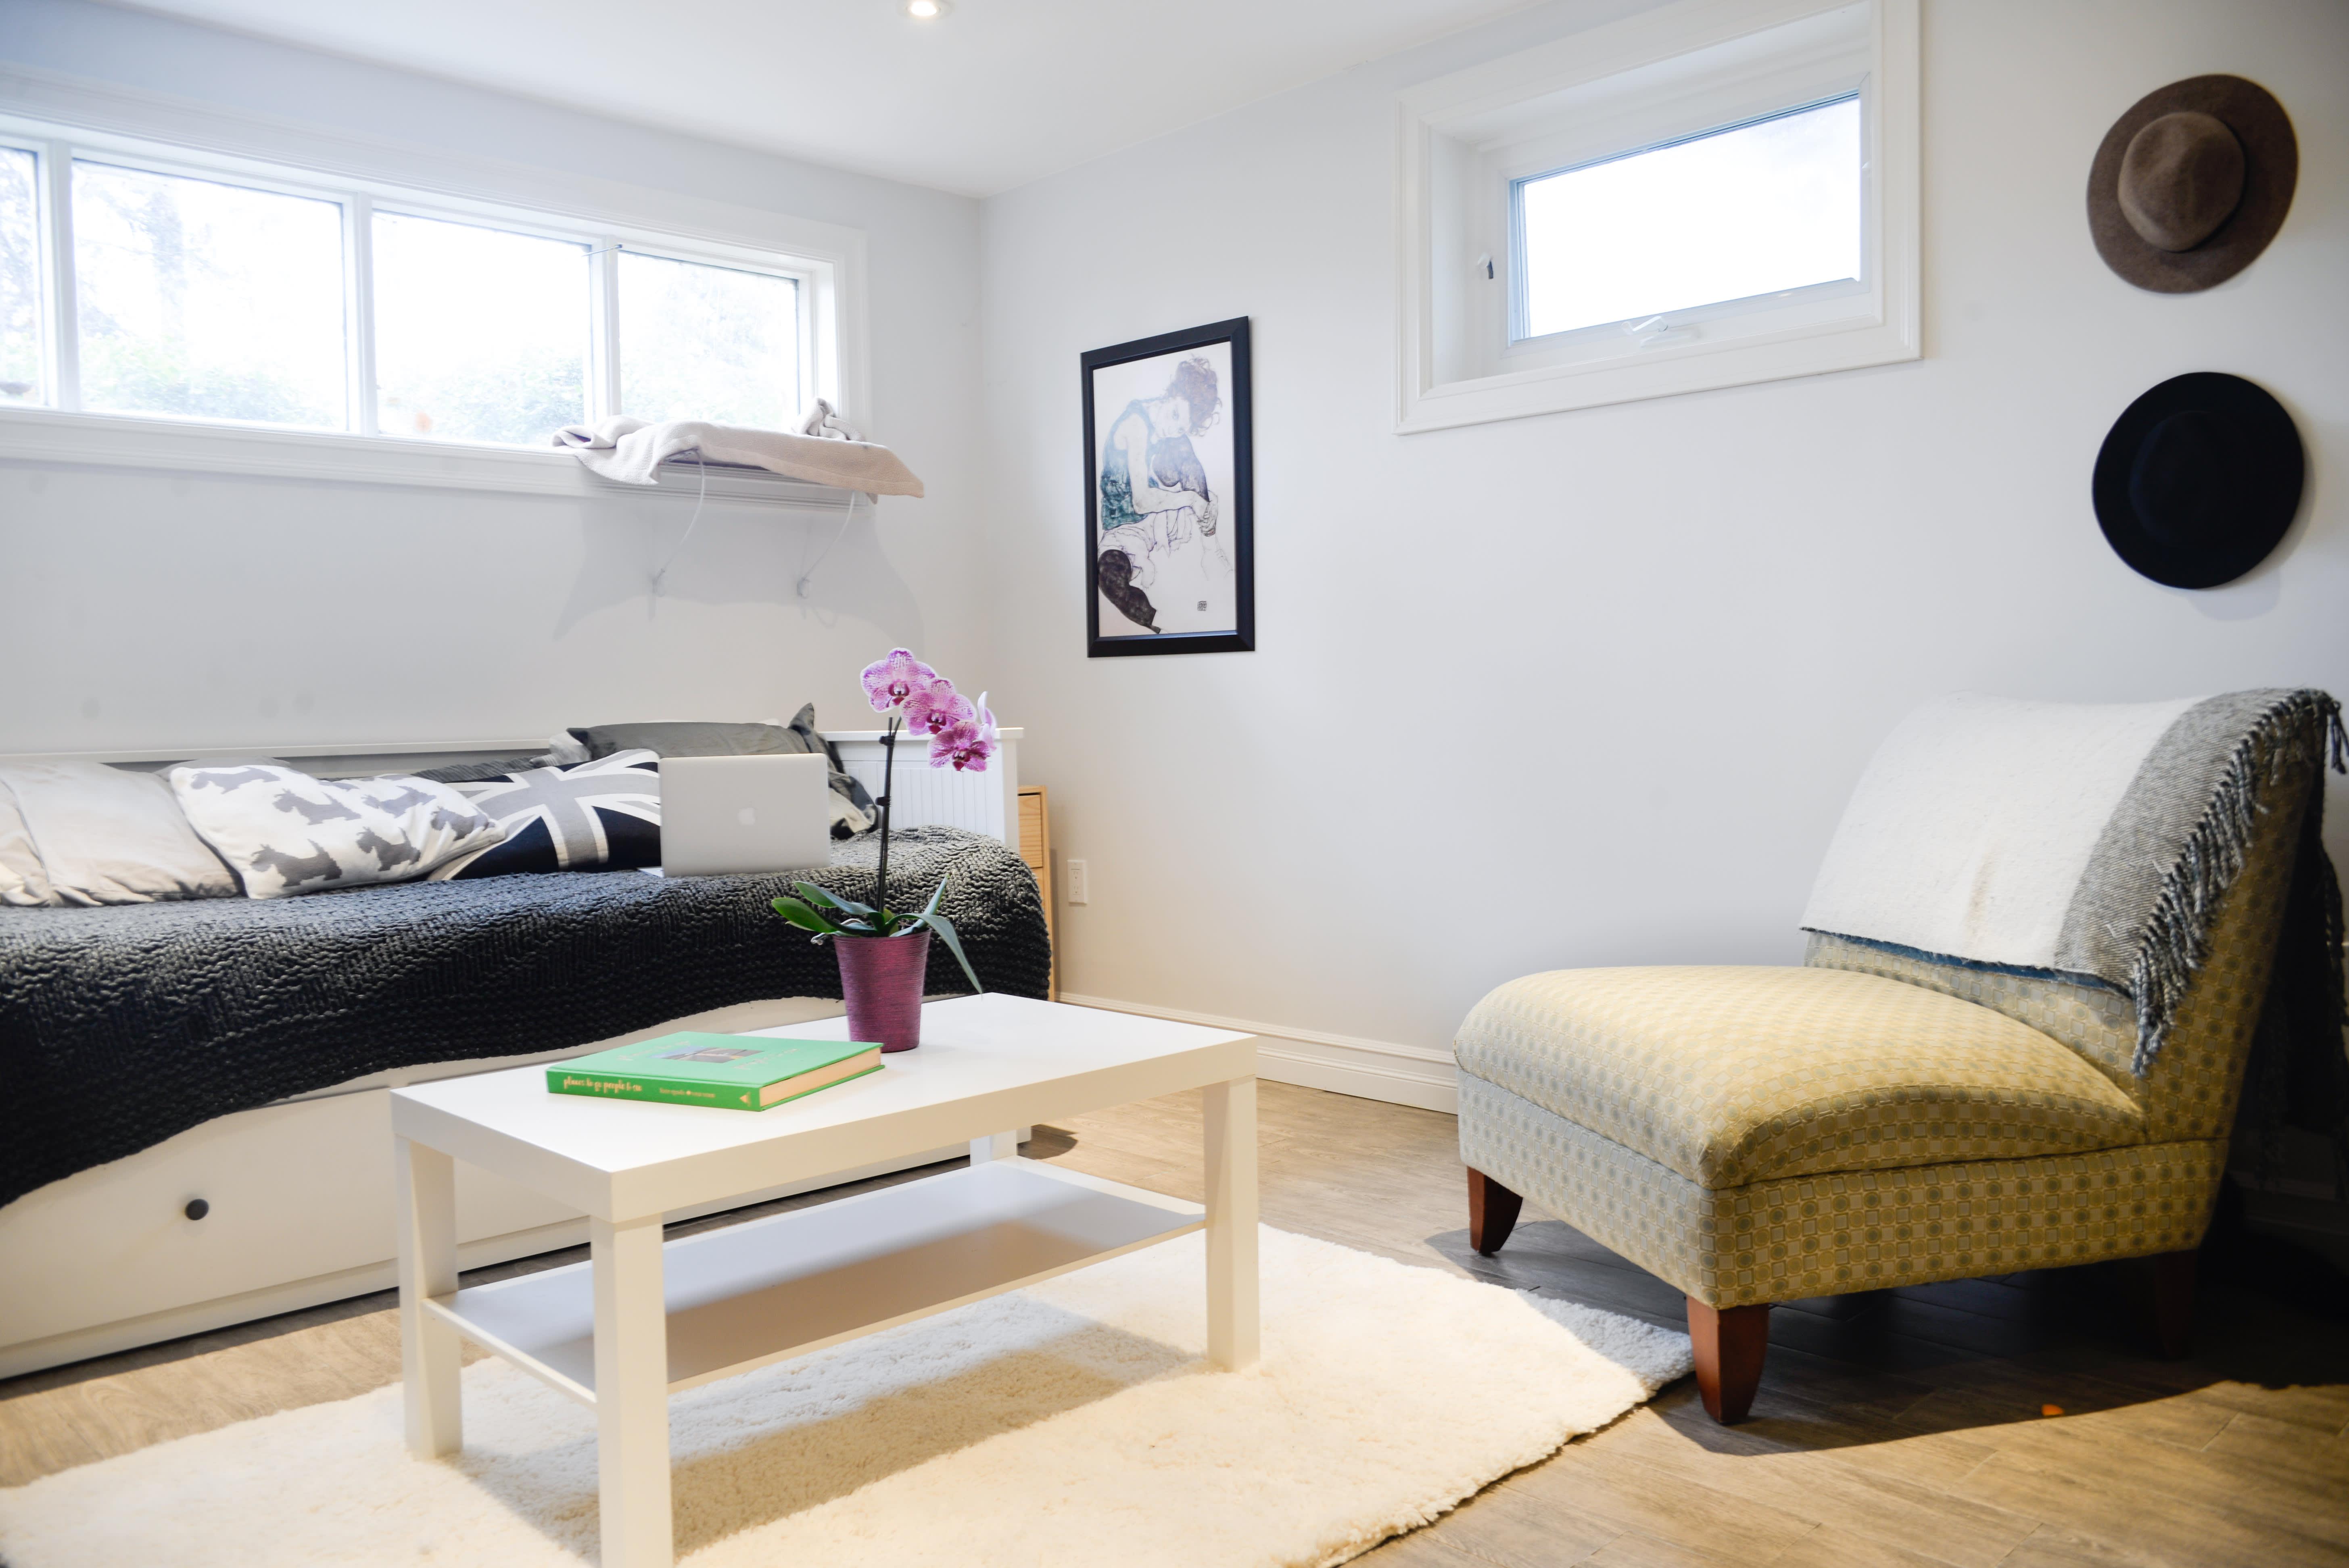 House Tour: A Small, Minimal Basement Studio Apartment ...